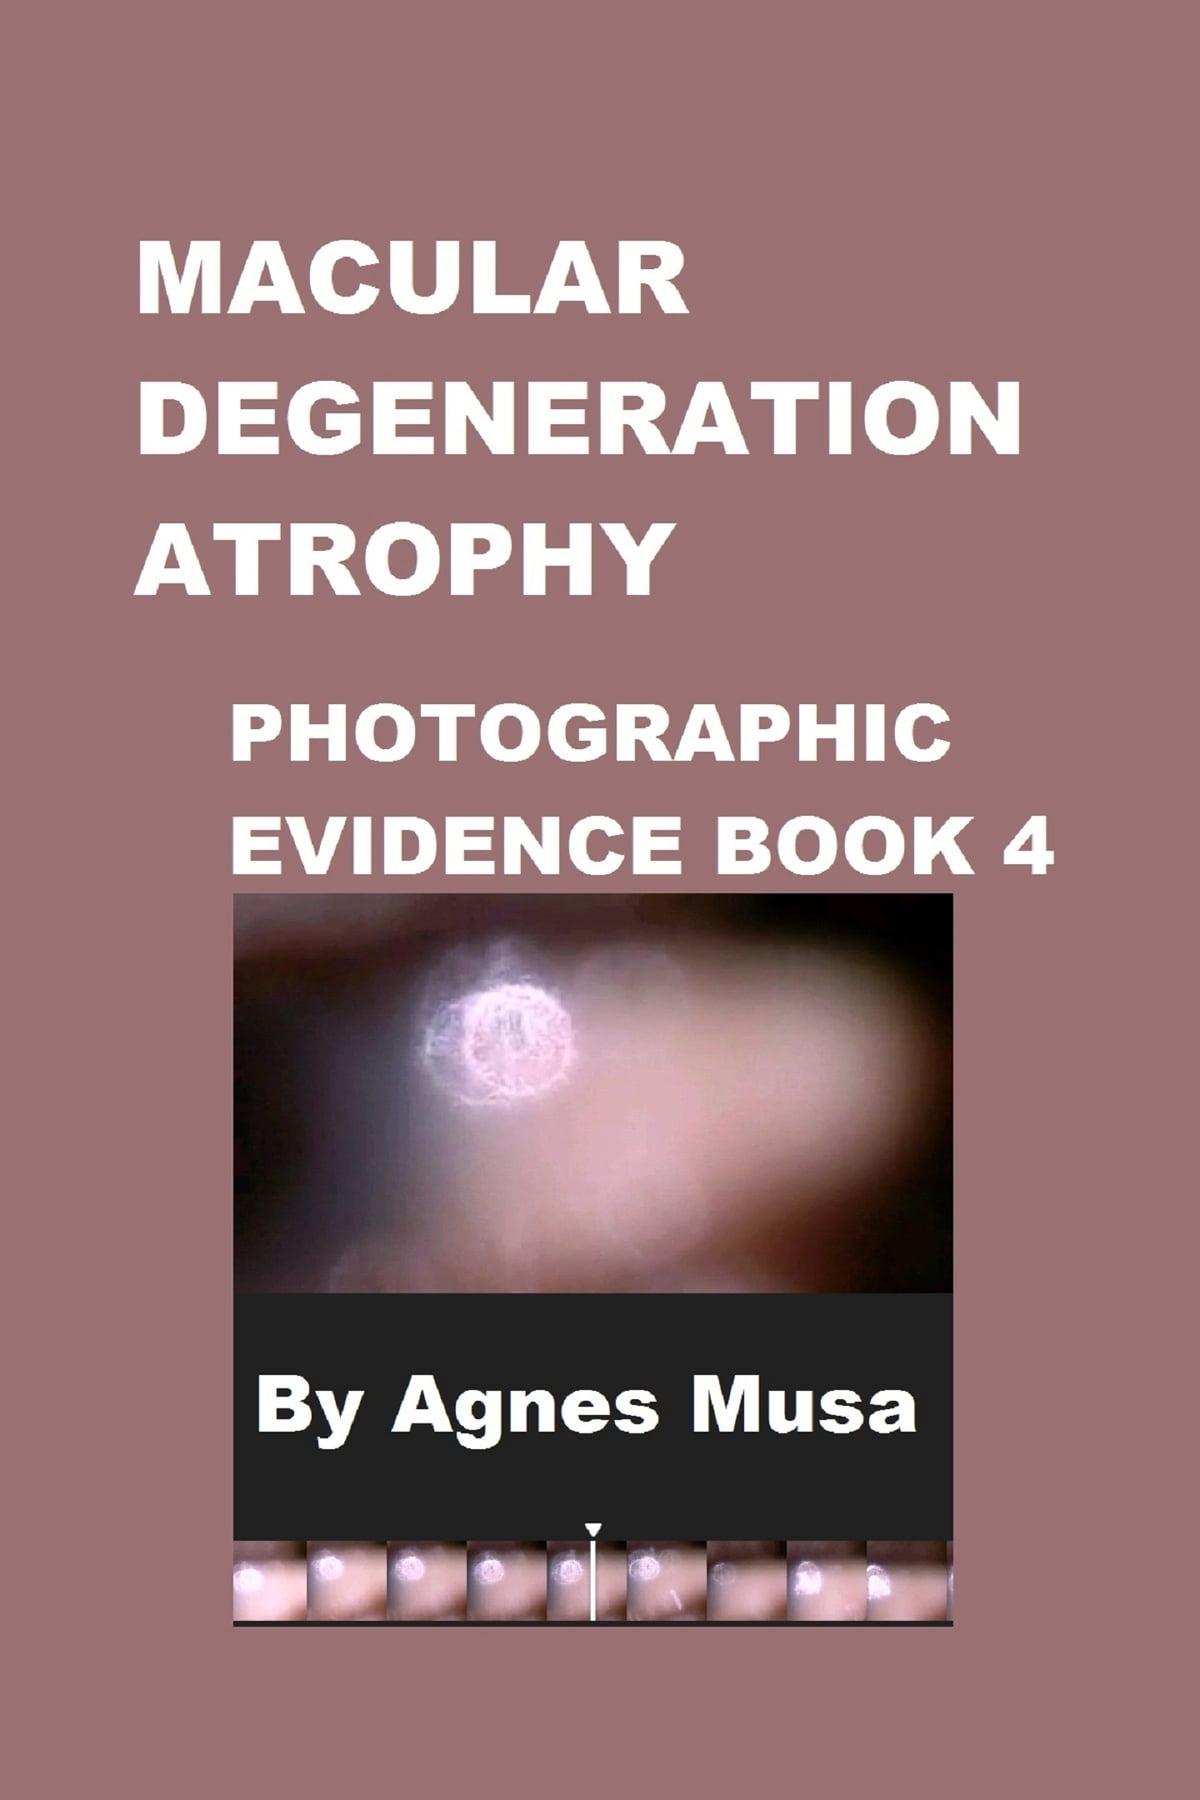 Macular Degeneration Atrophy, Photographic Evidence Book 4 eBook by Agnes Musa - 9781005227364 | Rakuten Kobo Canada